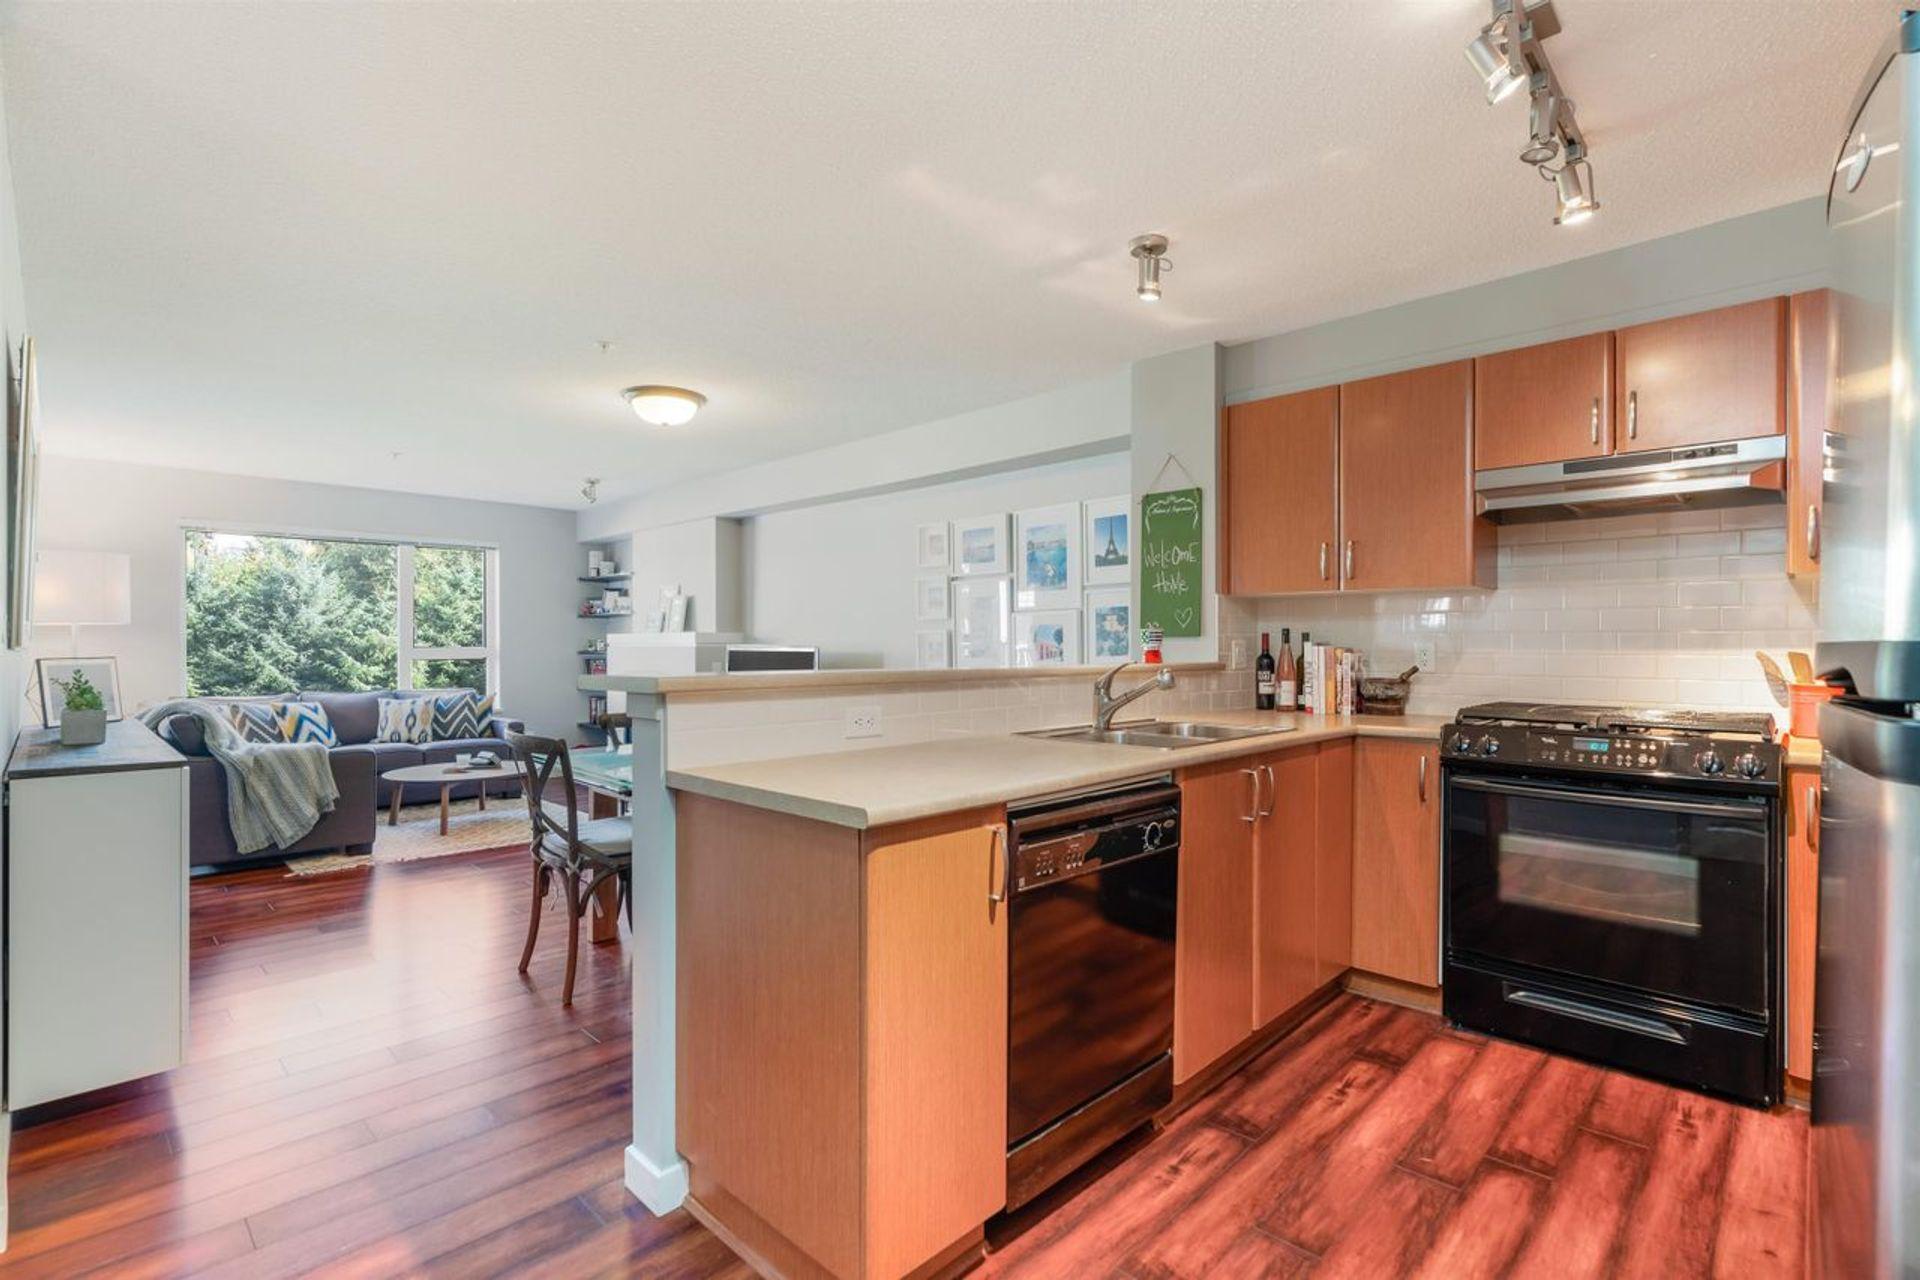 4723-dawson-street-brentwood-park-burnaby-north-14 at 301 - 4723 Dawson Street, Brentwood Park, Burnaby North